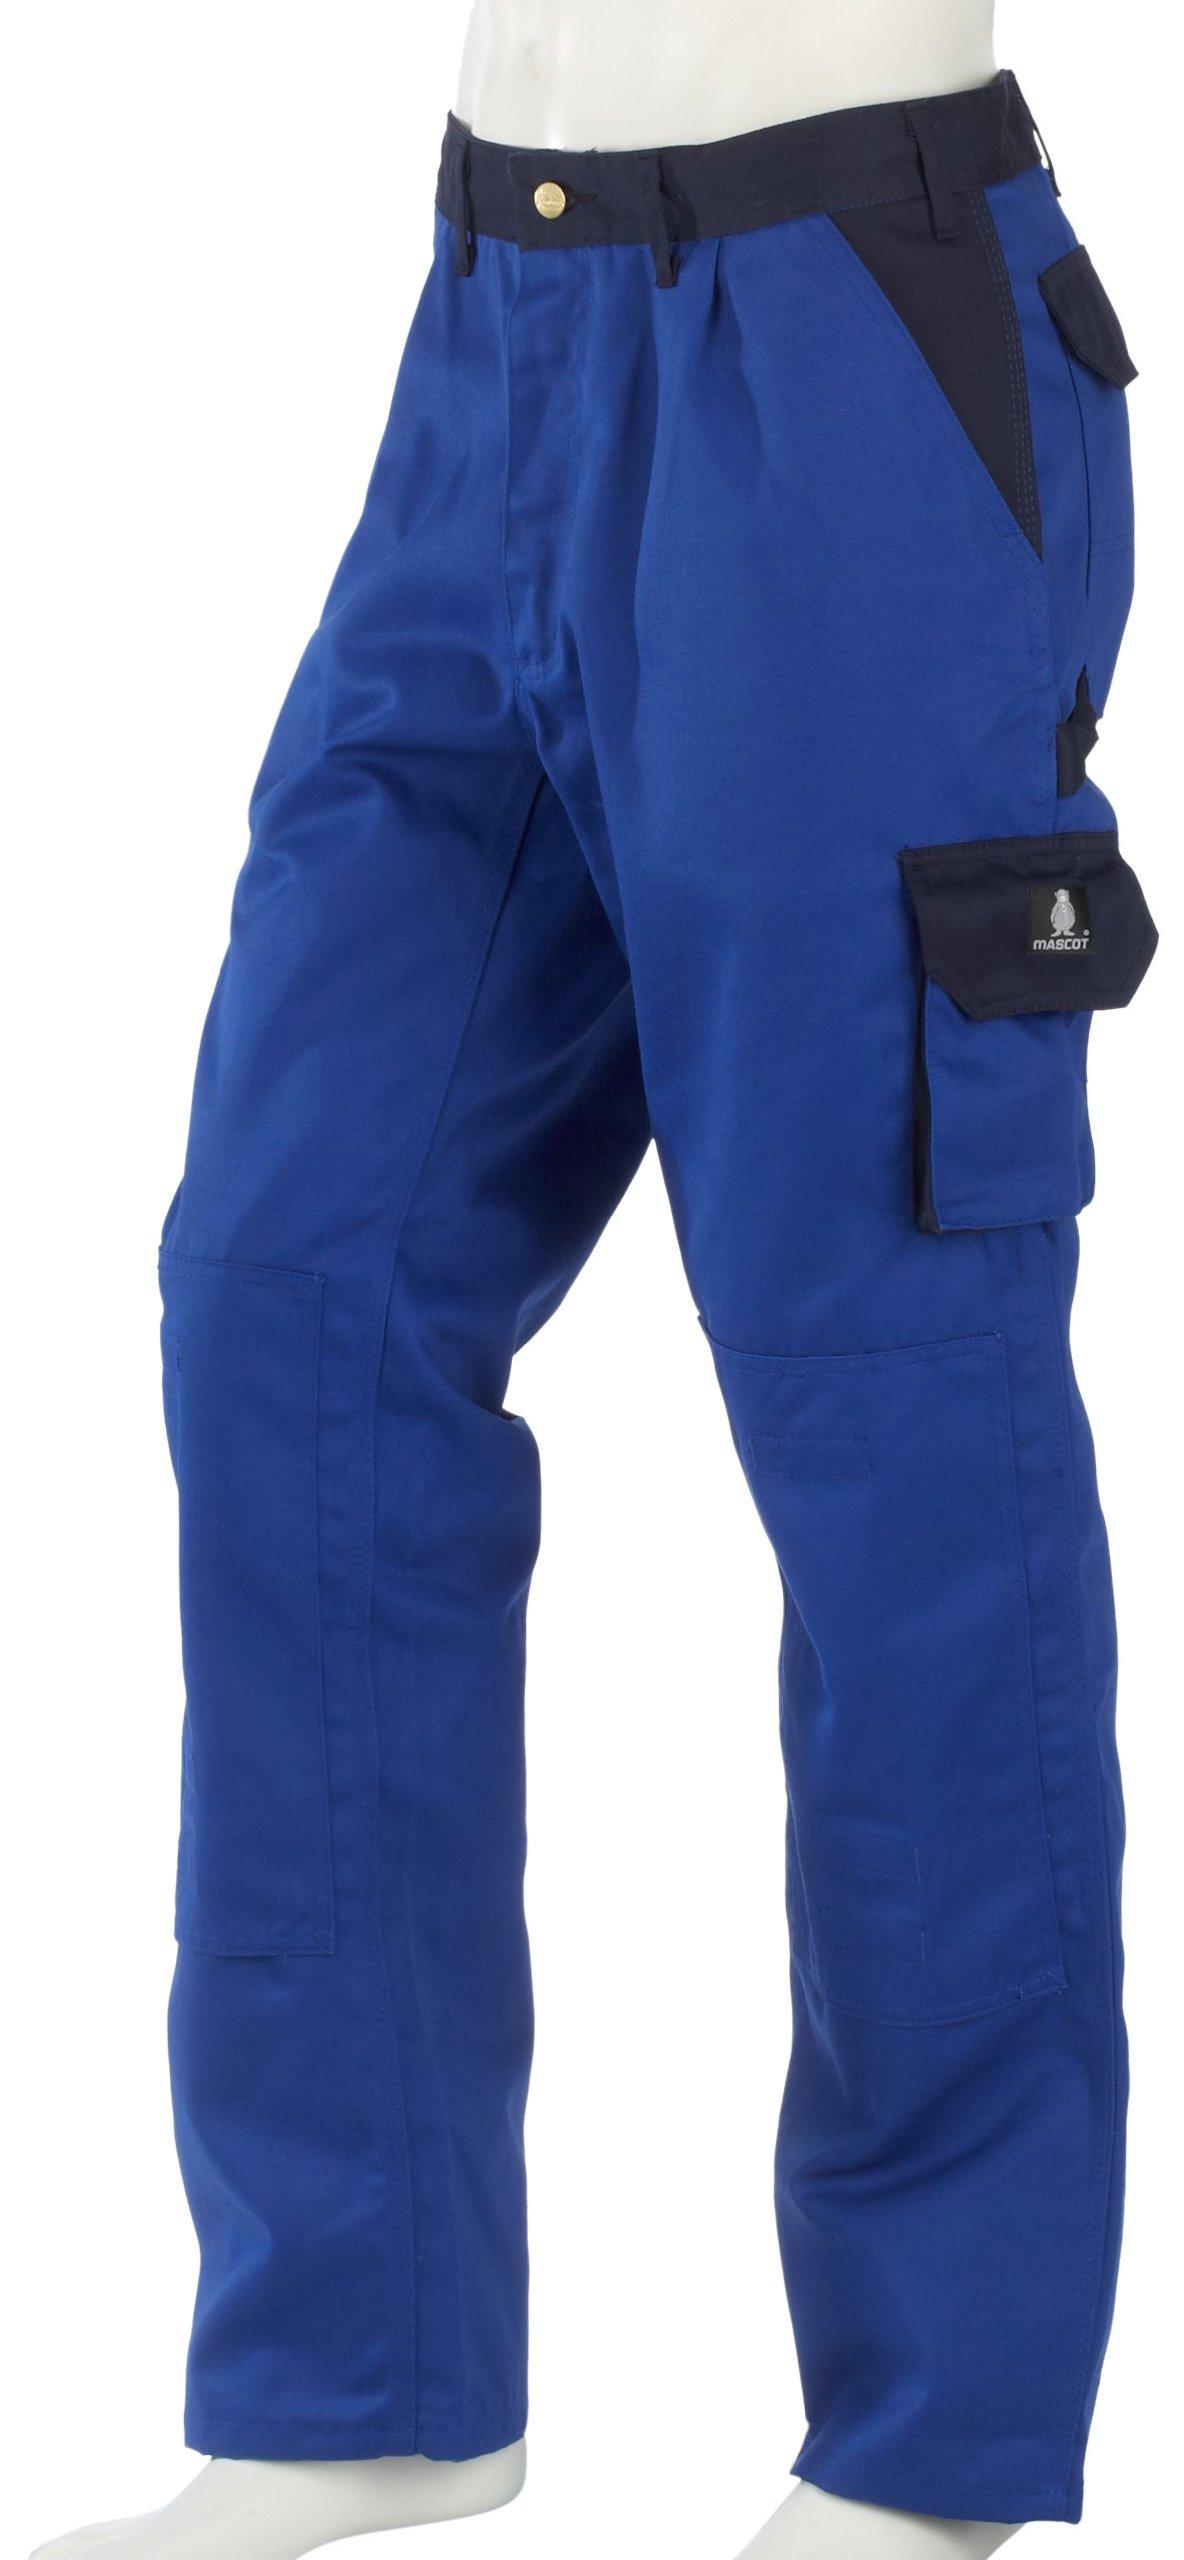 Mascot 00979-430-1101-82C50''Torino'' Trousers, Cornflower Blue/Marine Blue, L82cm/C50